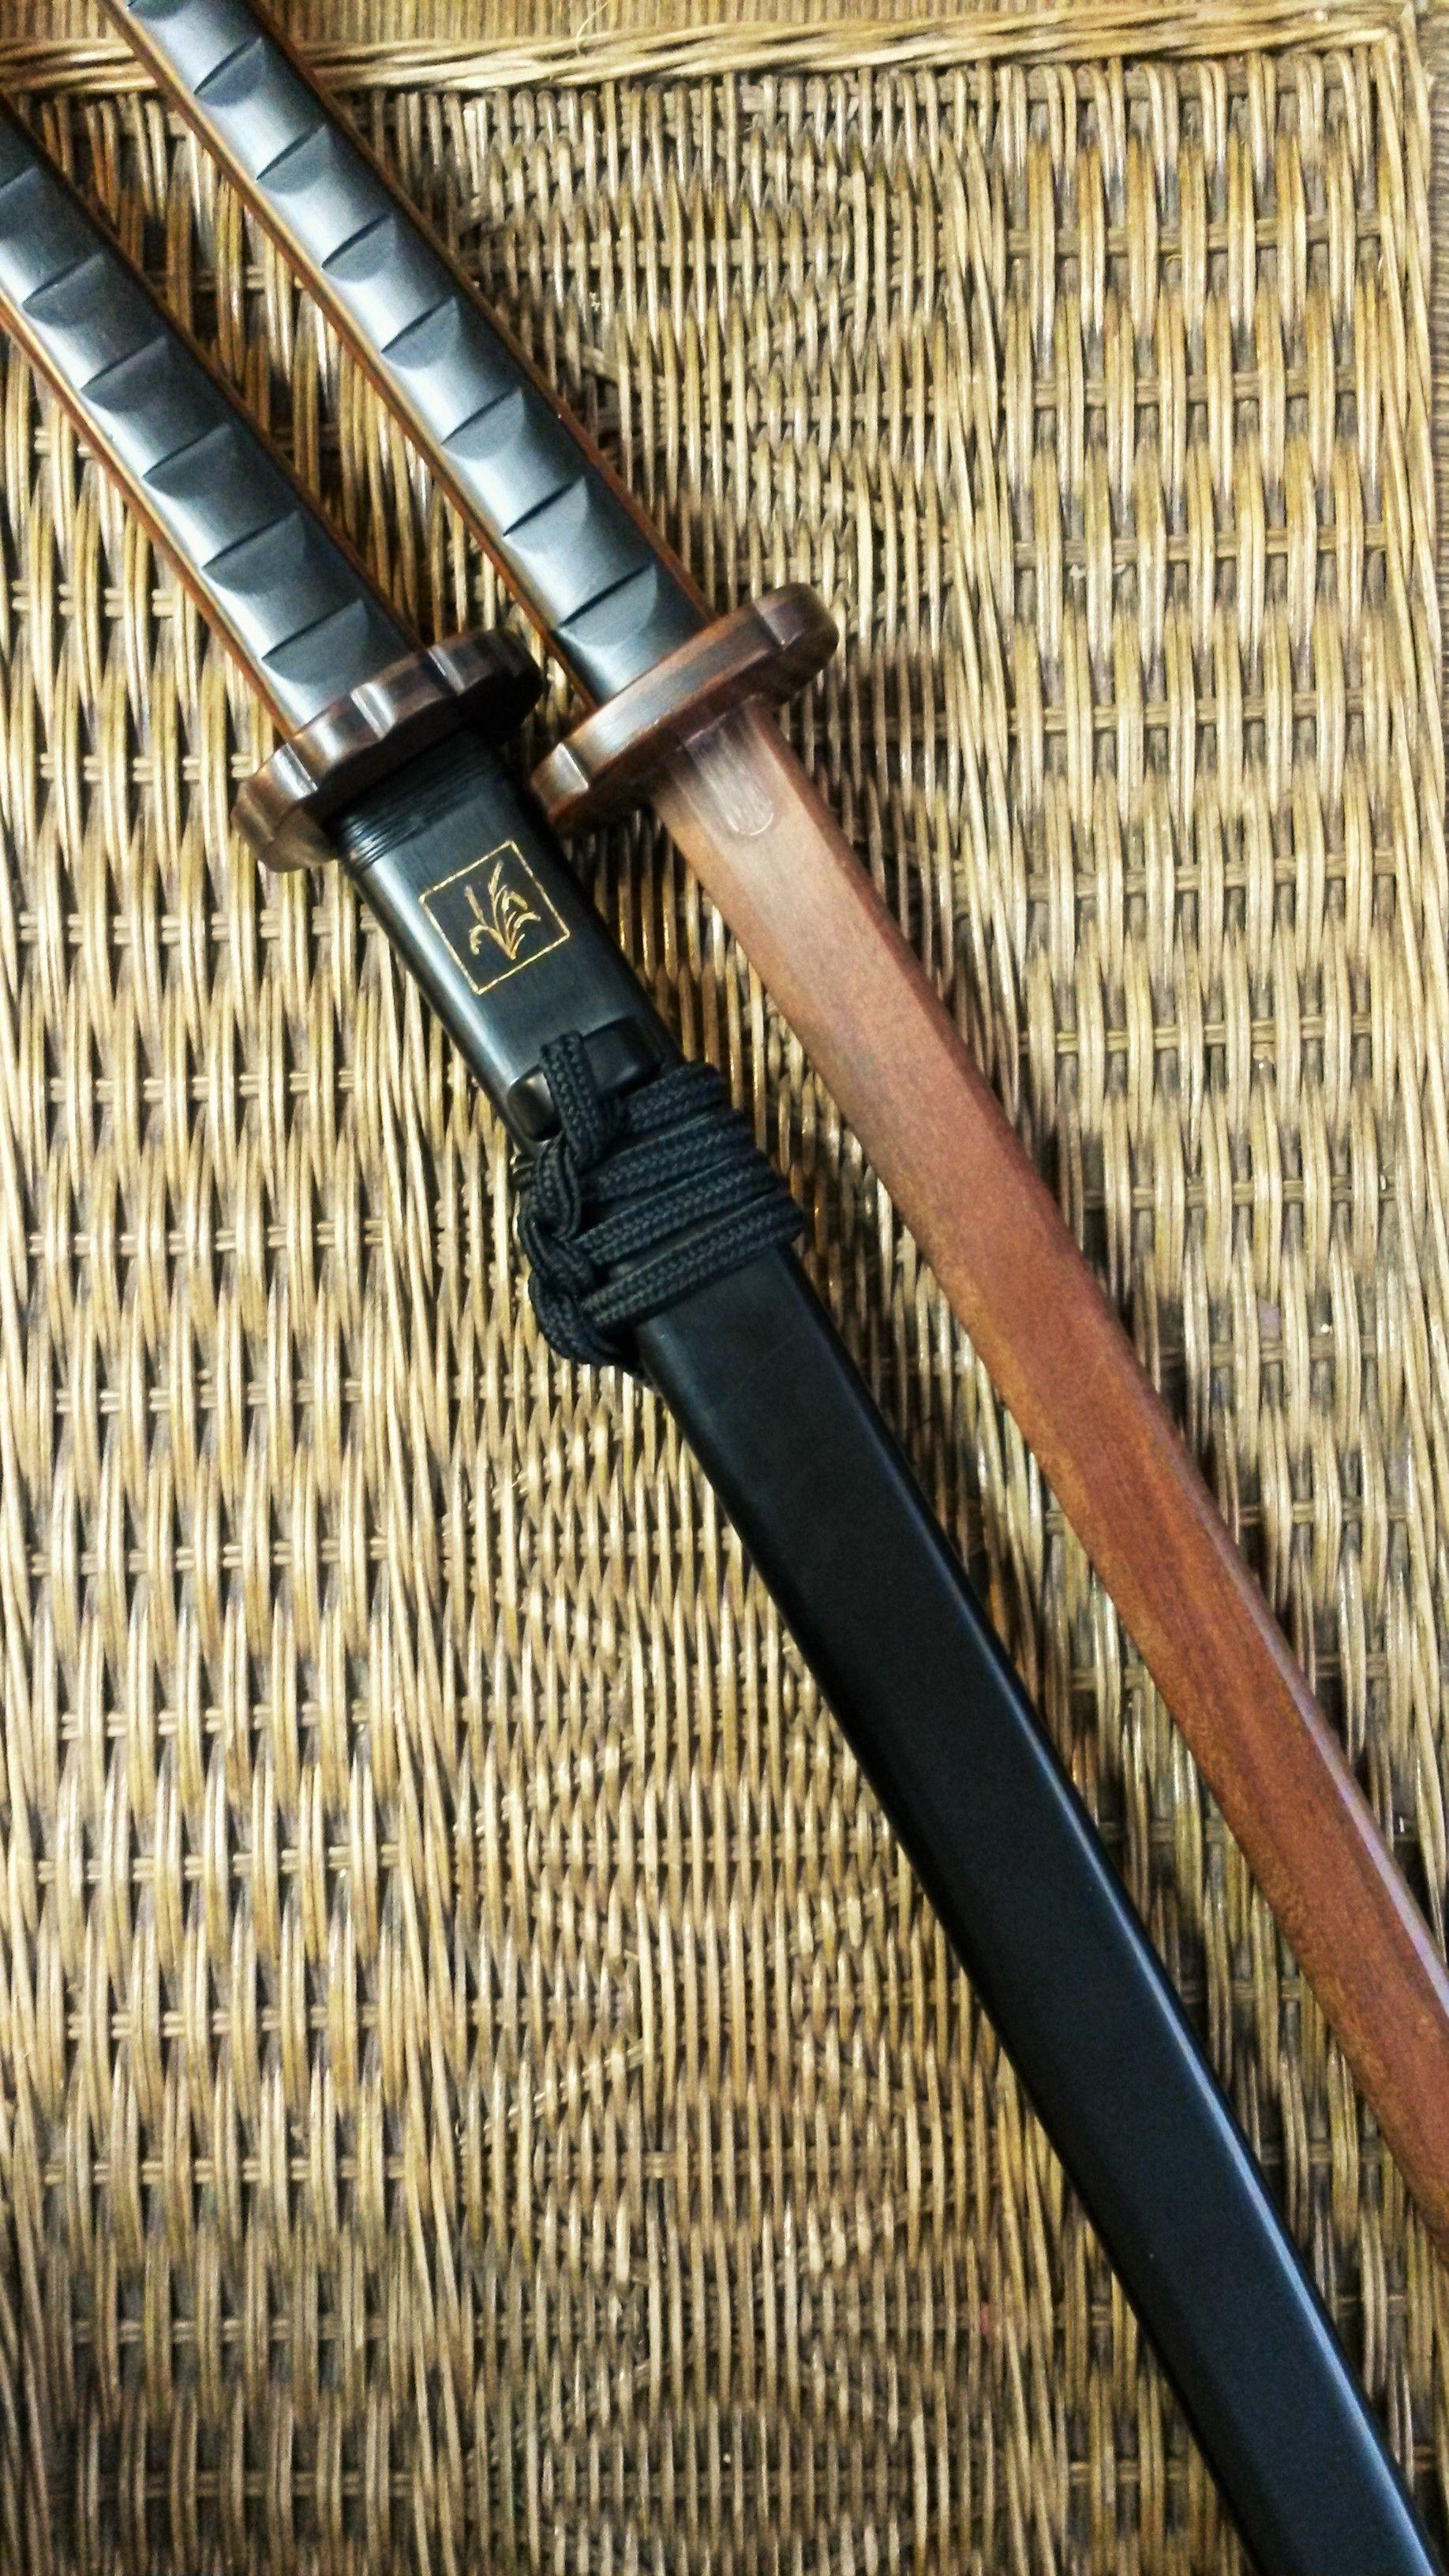 mogami yoshiaki u0027s katana sword hanging miniature papercraft free